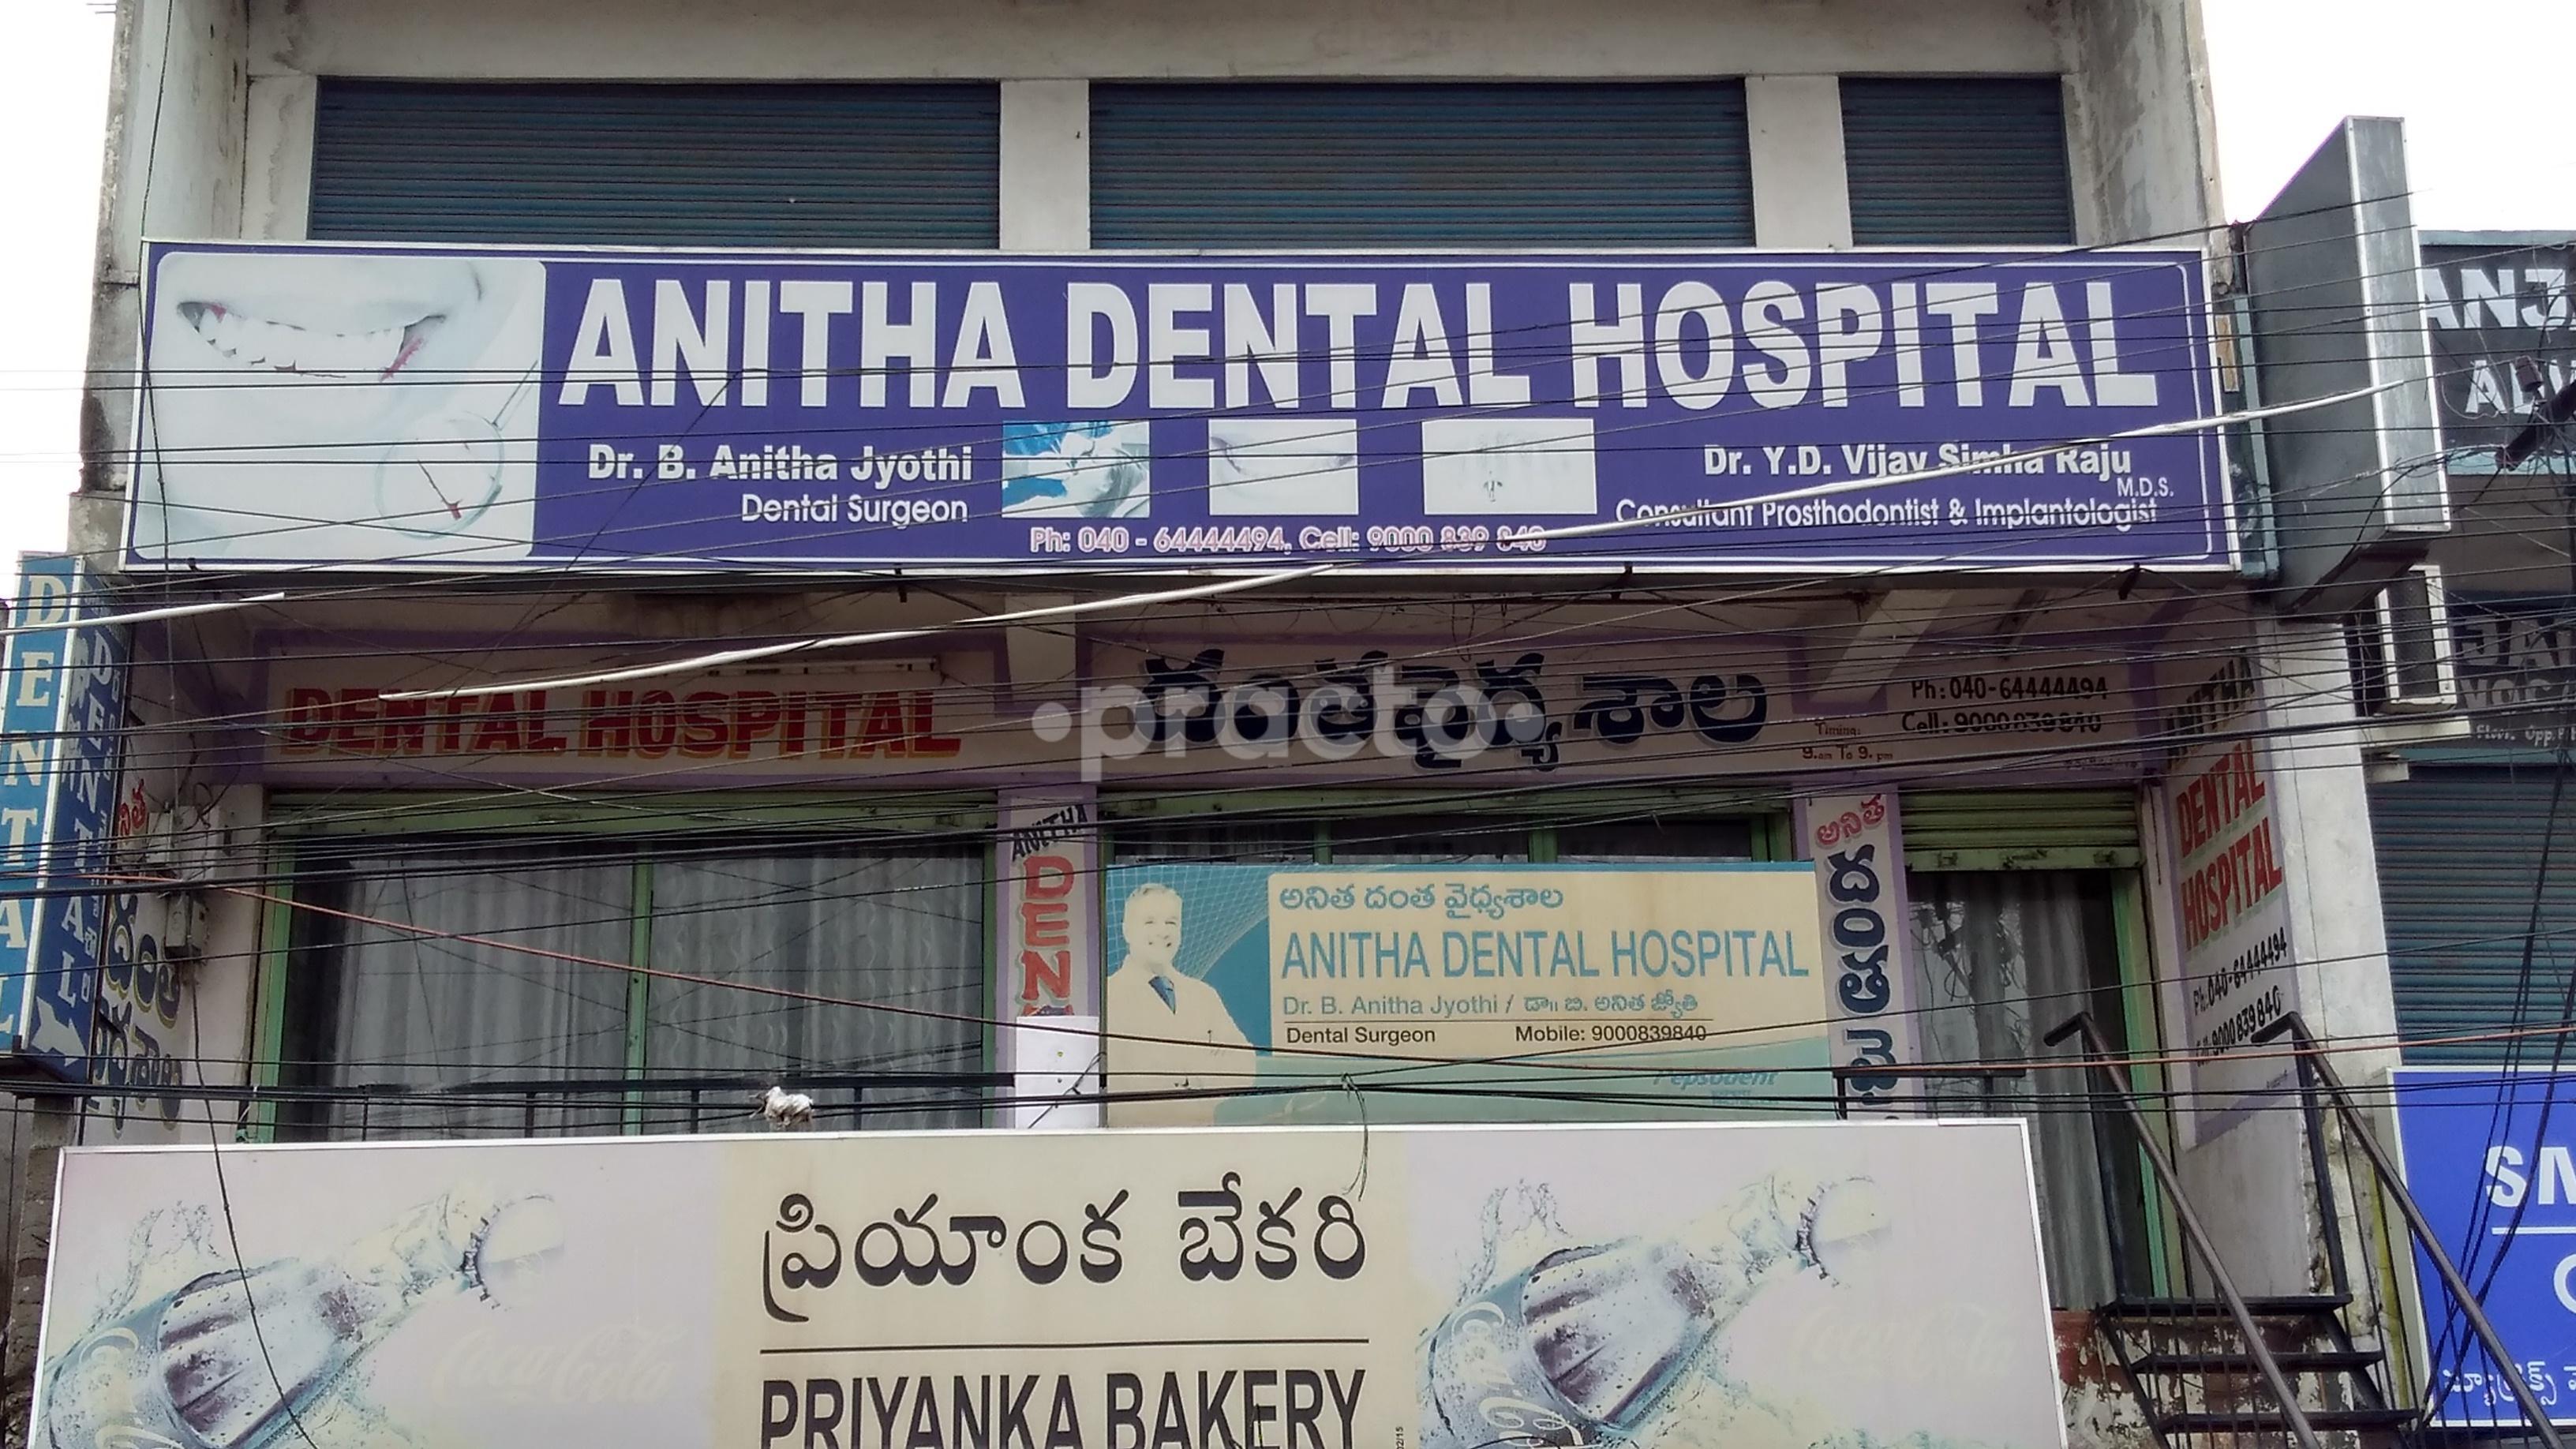 Anitha Dental Hospital